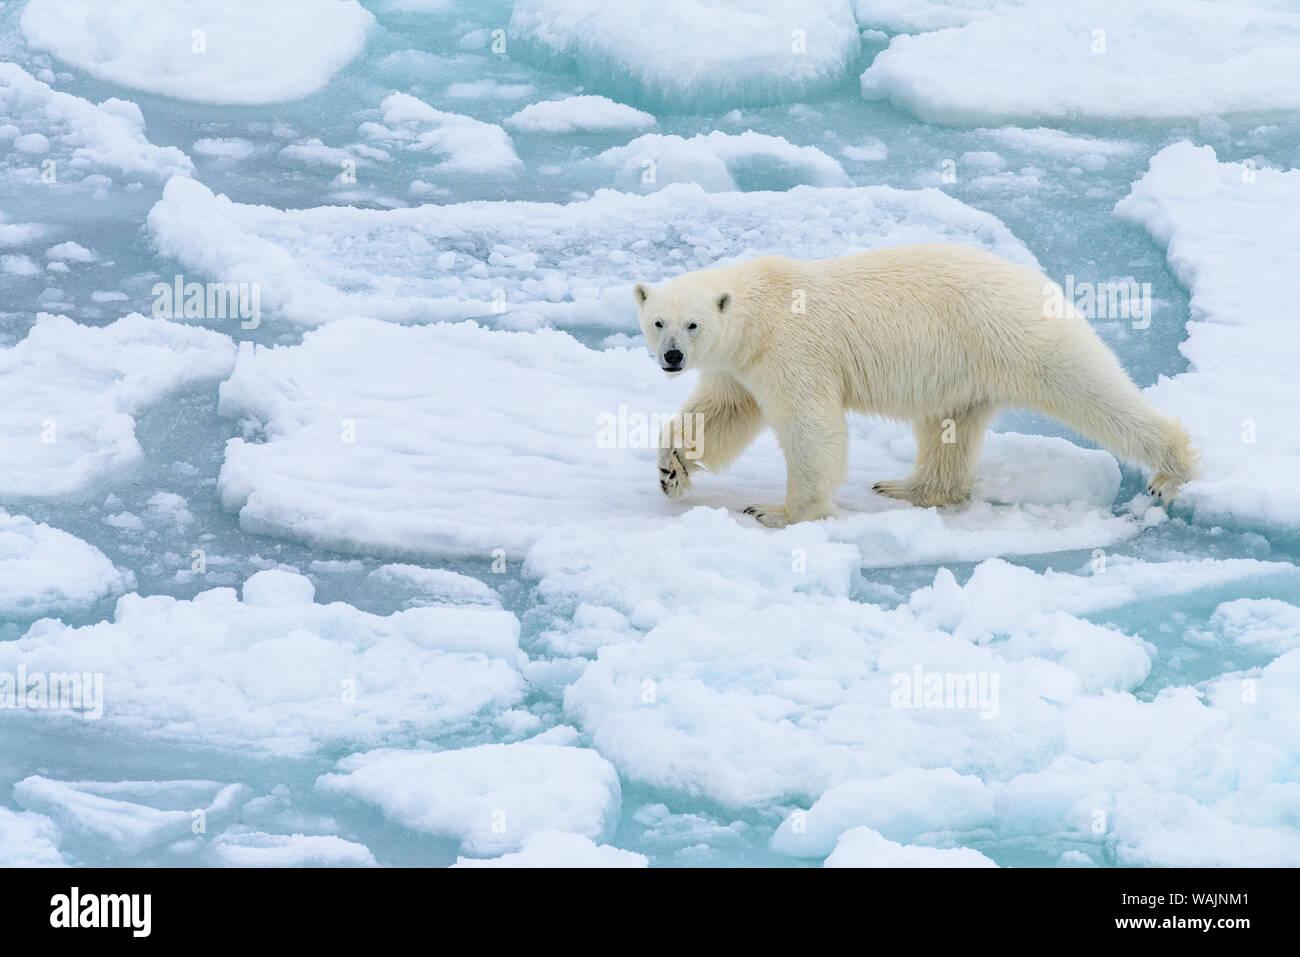 Norway, Svalbard, 82 degrees North. Polar bear on the move. Stock Photo